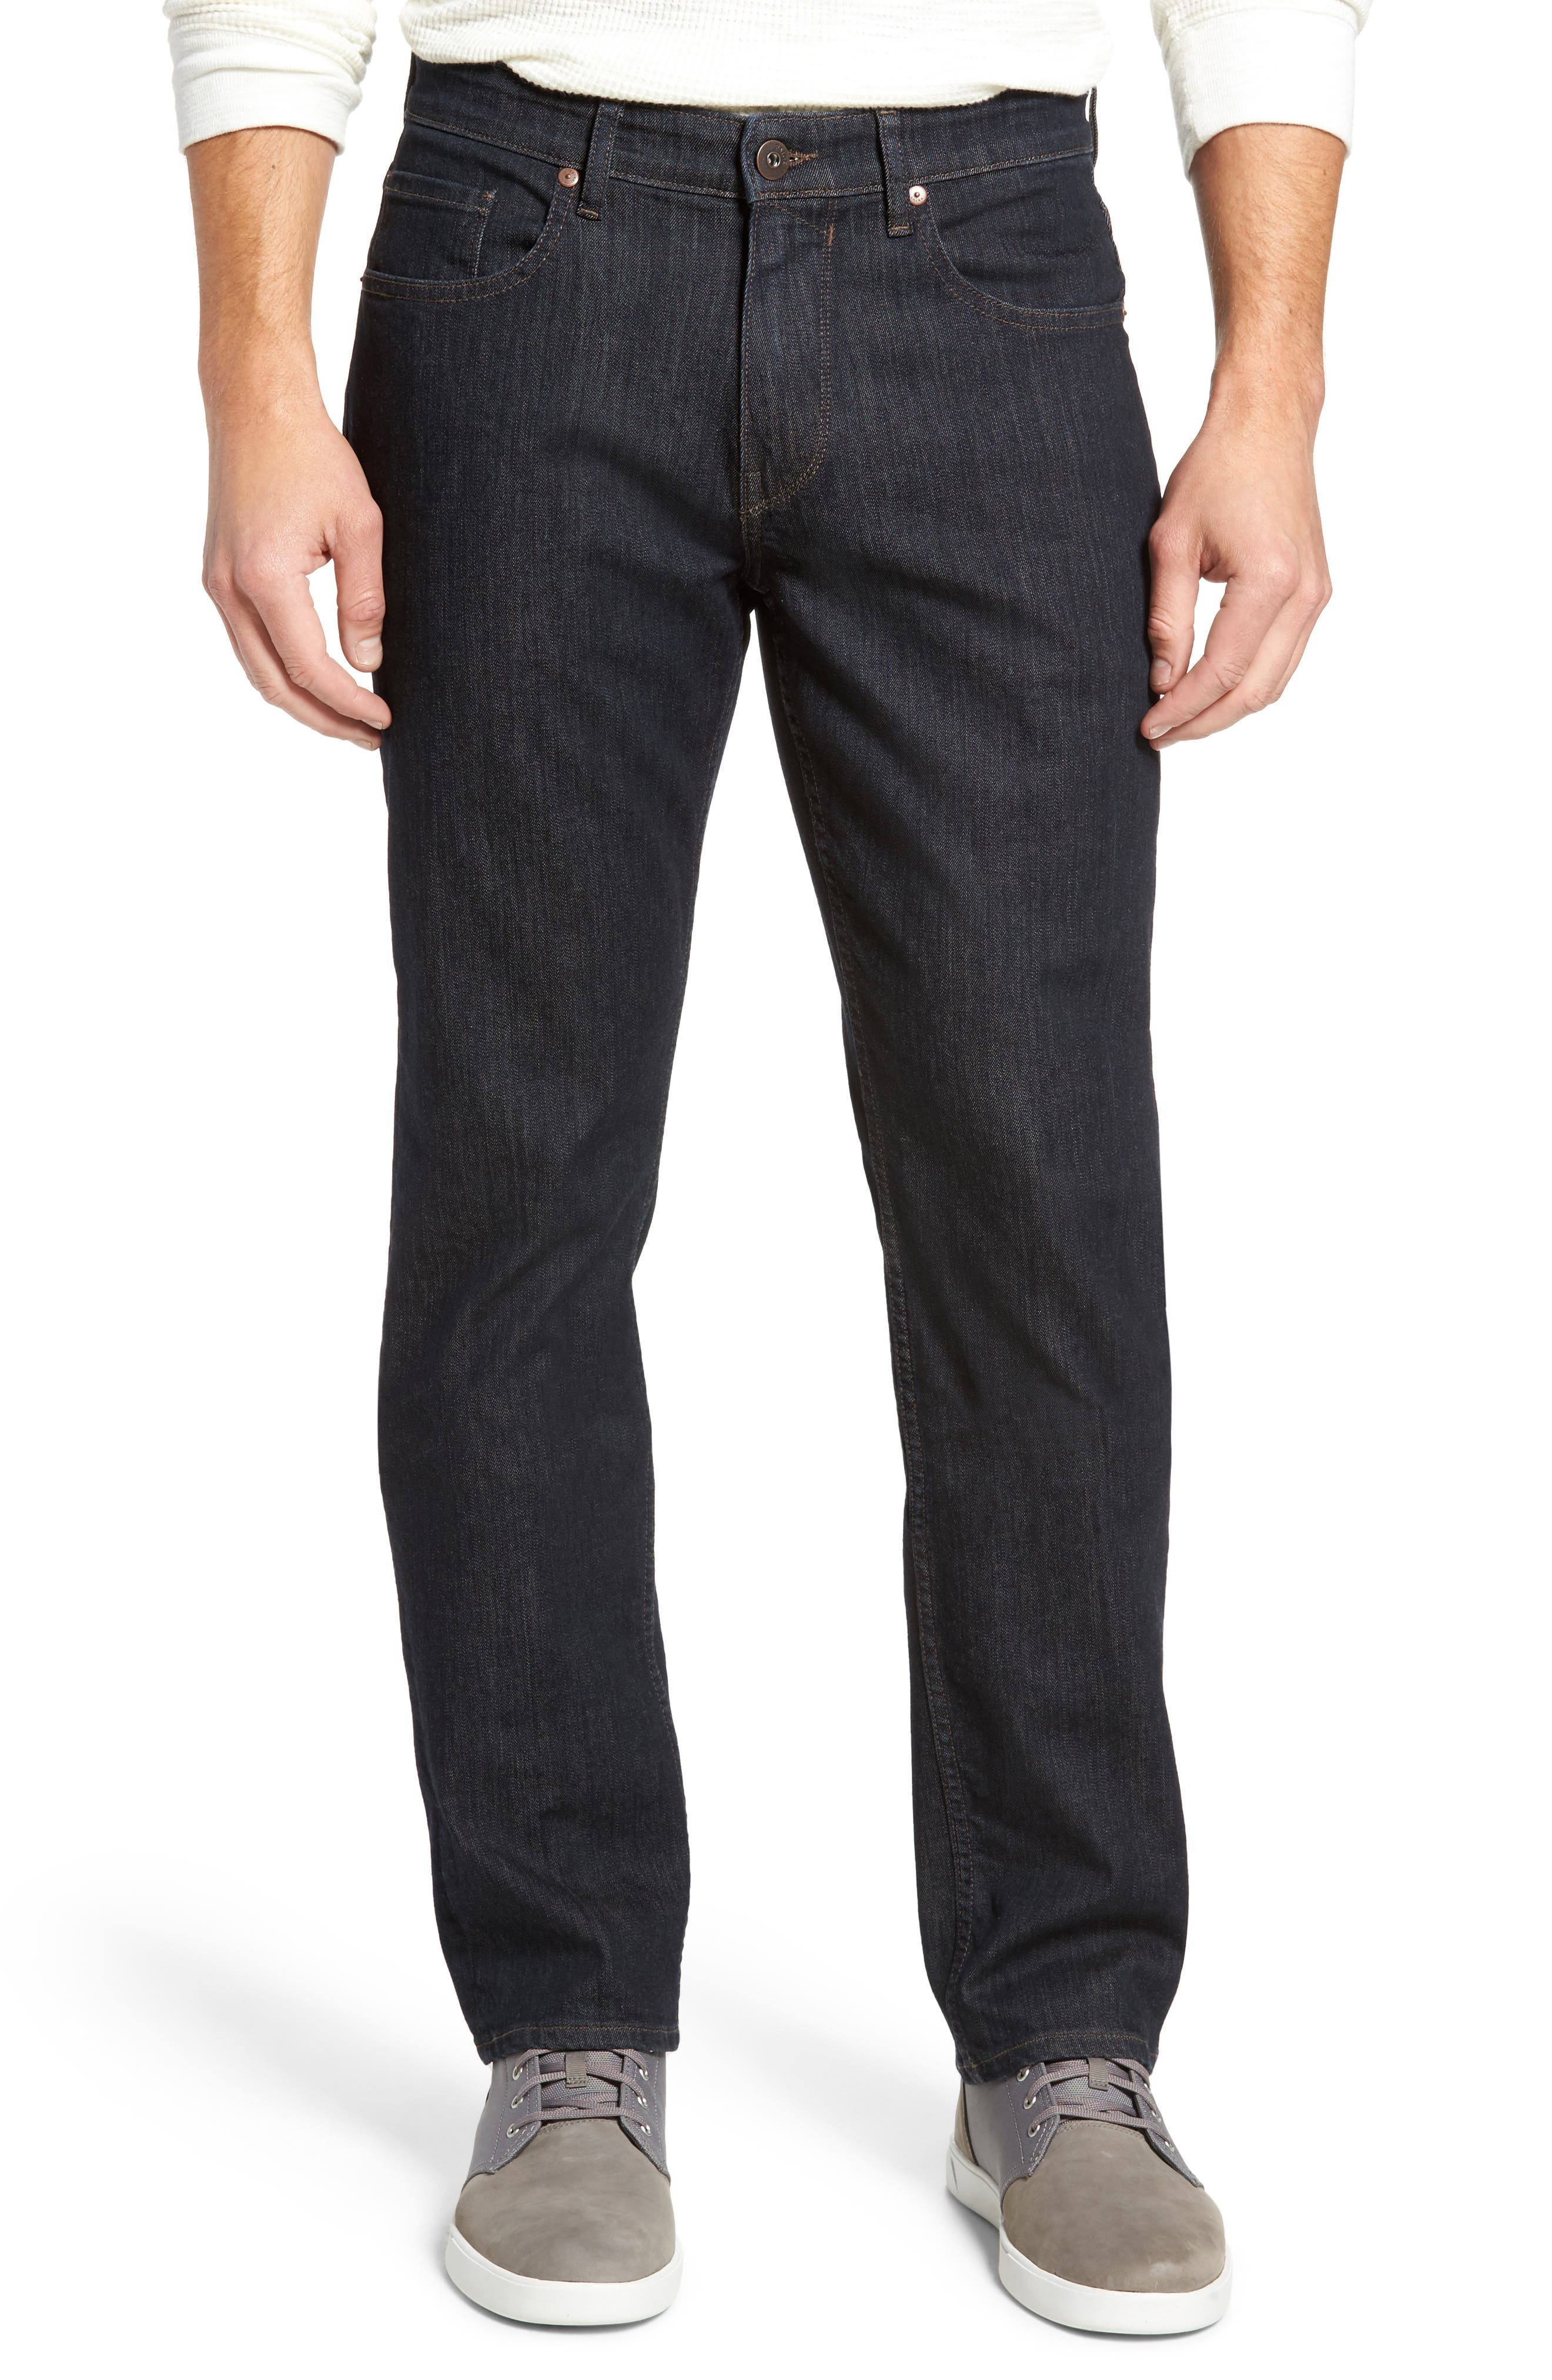 PAIGE Normandie Straight Leg Jeans